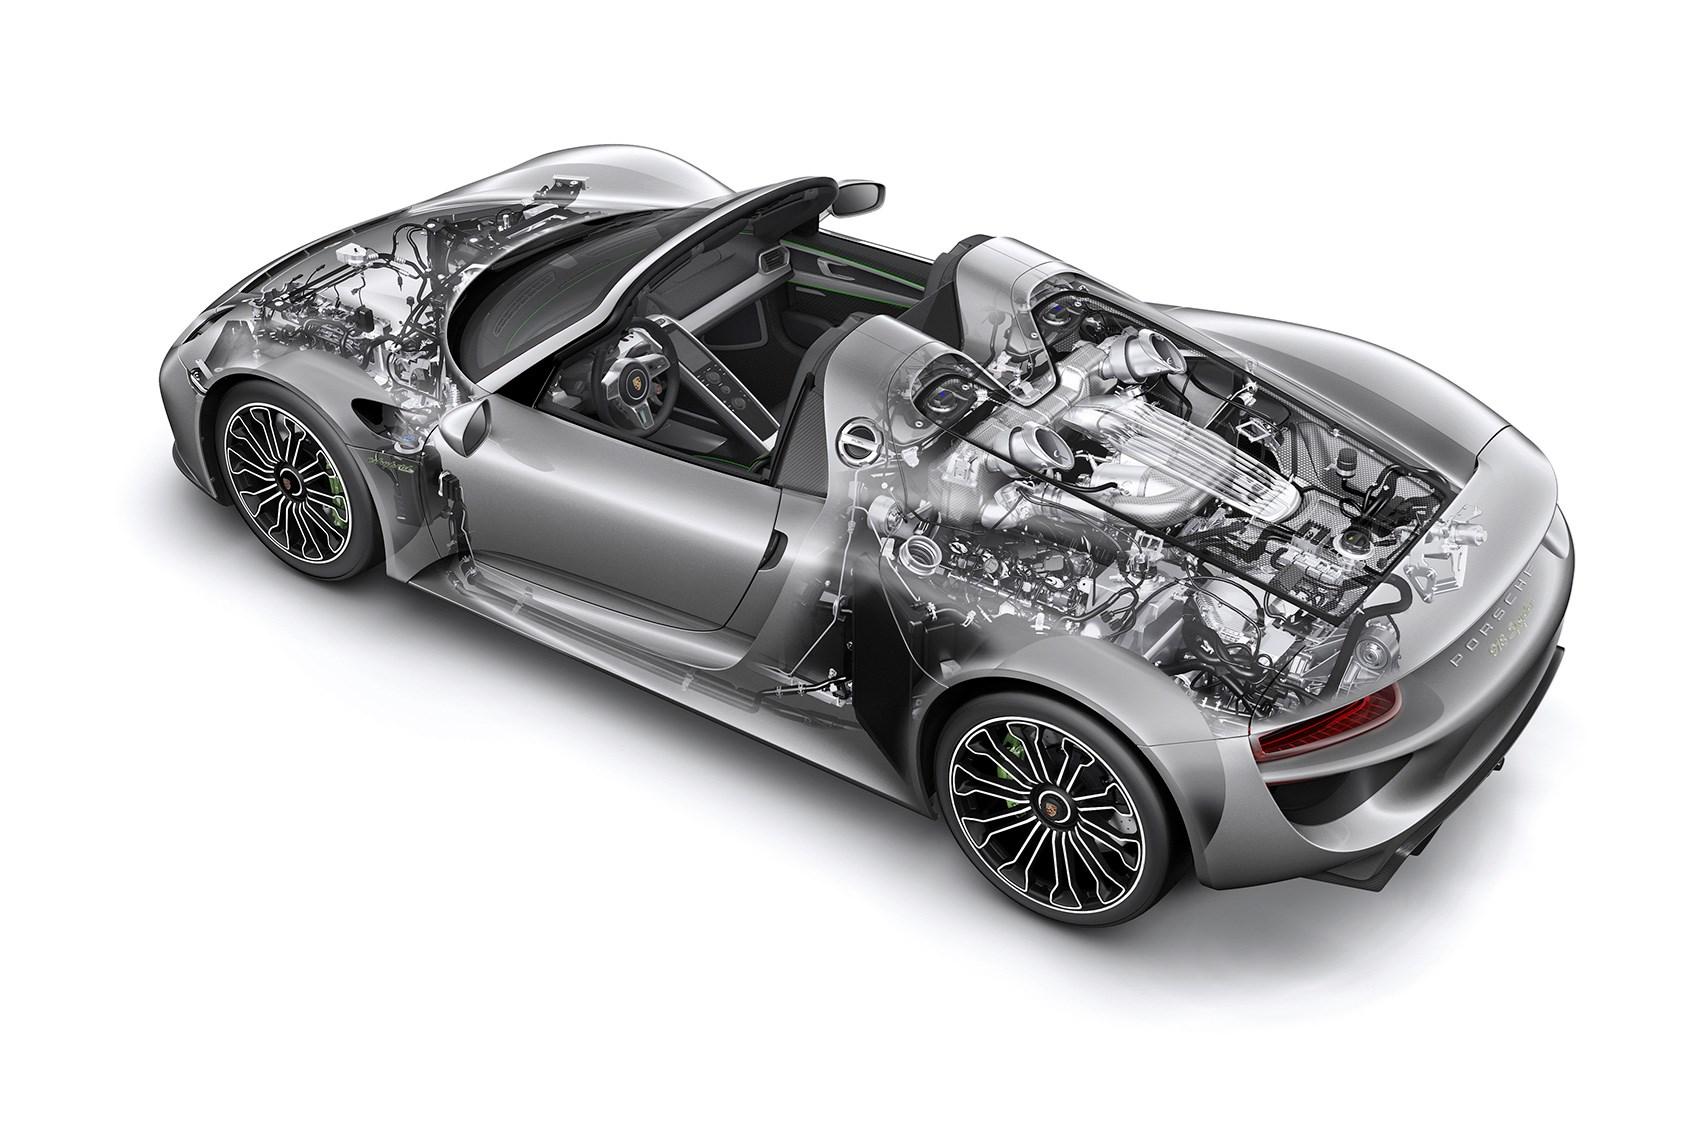 porsche-918-spyder Amazing Porsche 918 Spyder sold Out Cars Trend